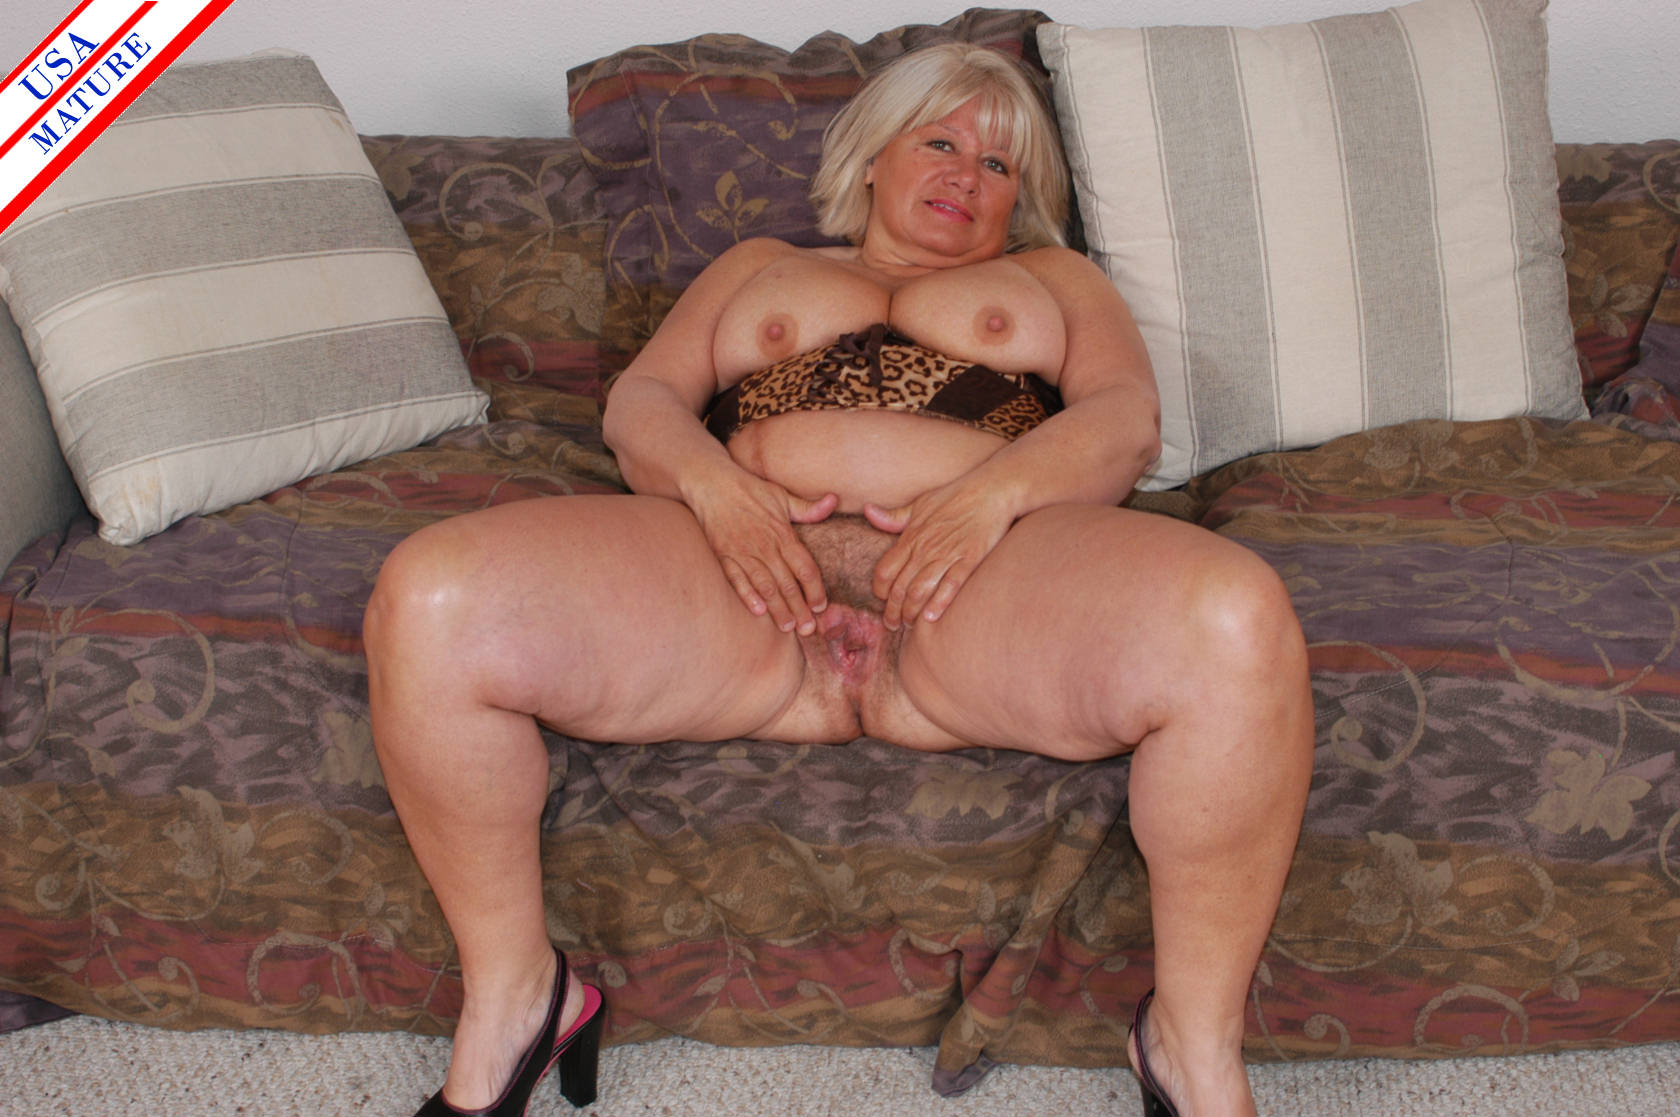 Фото пизды жирных баб раком 17 фотография